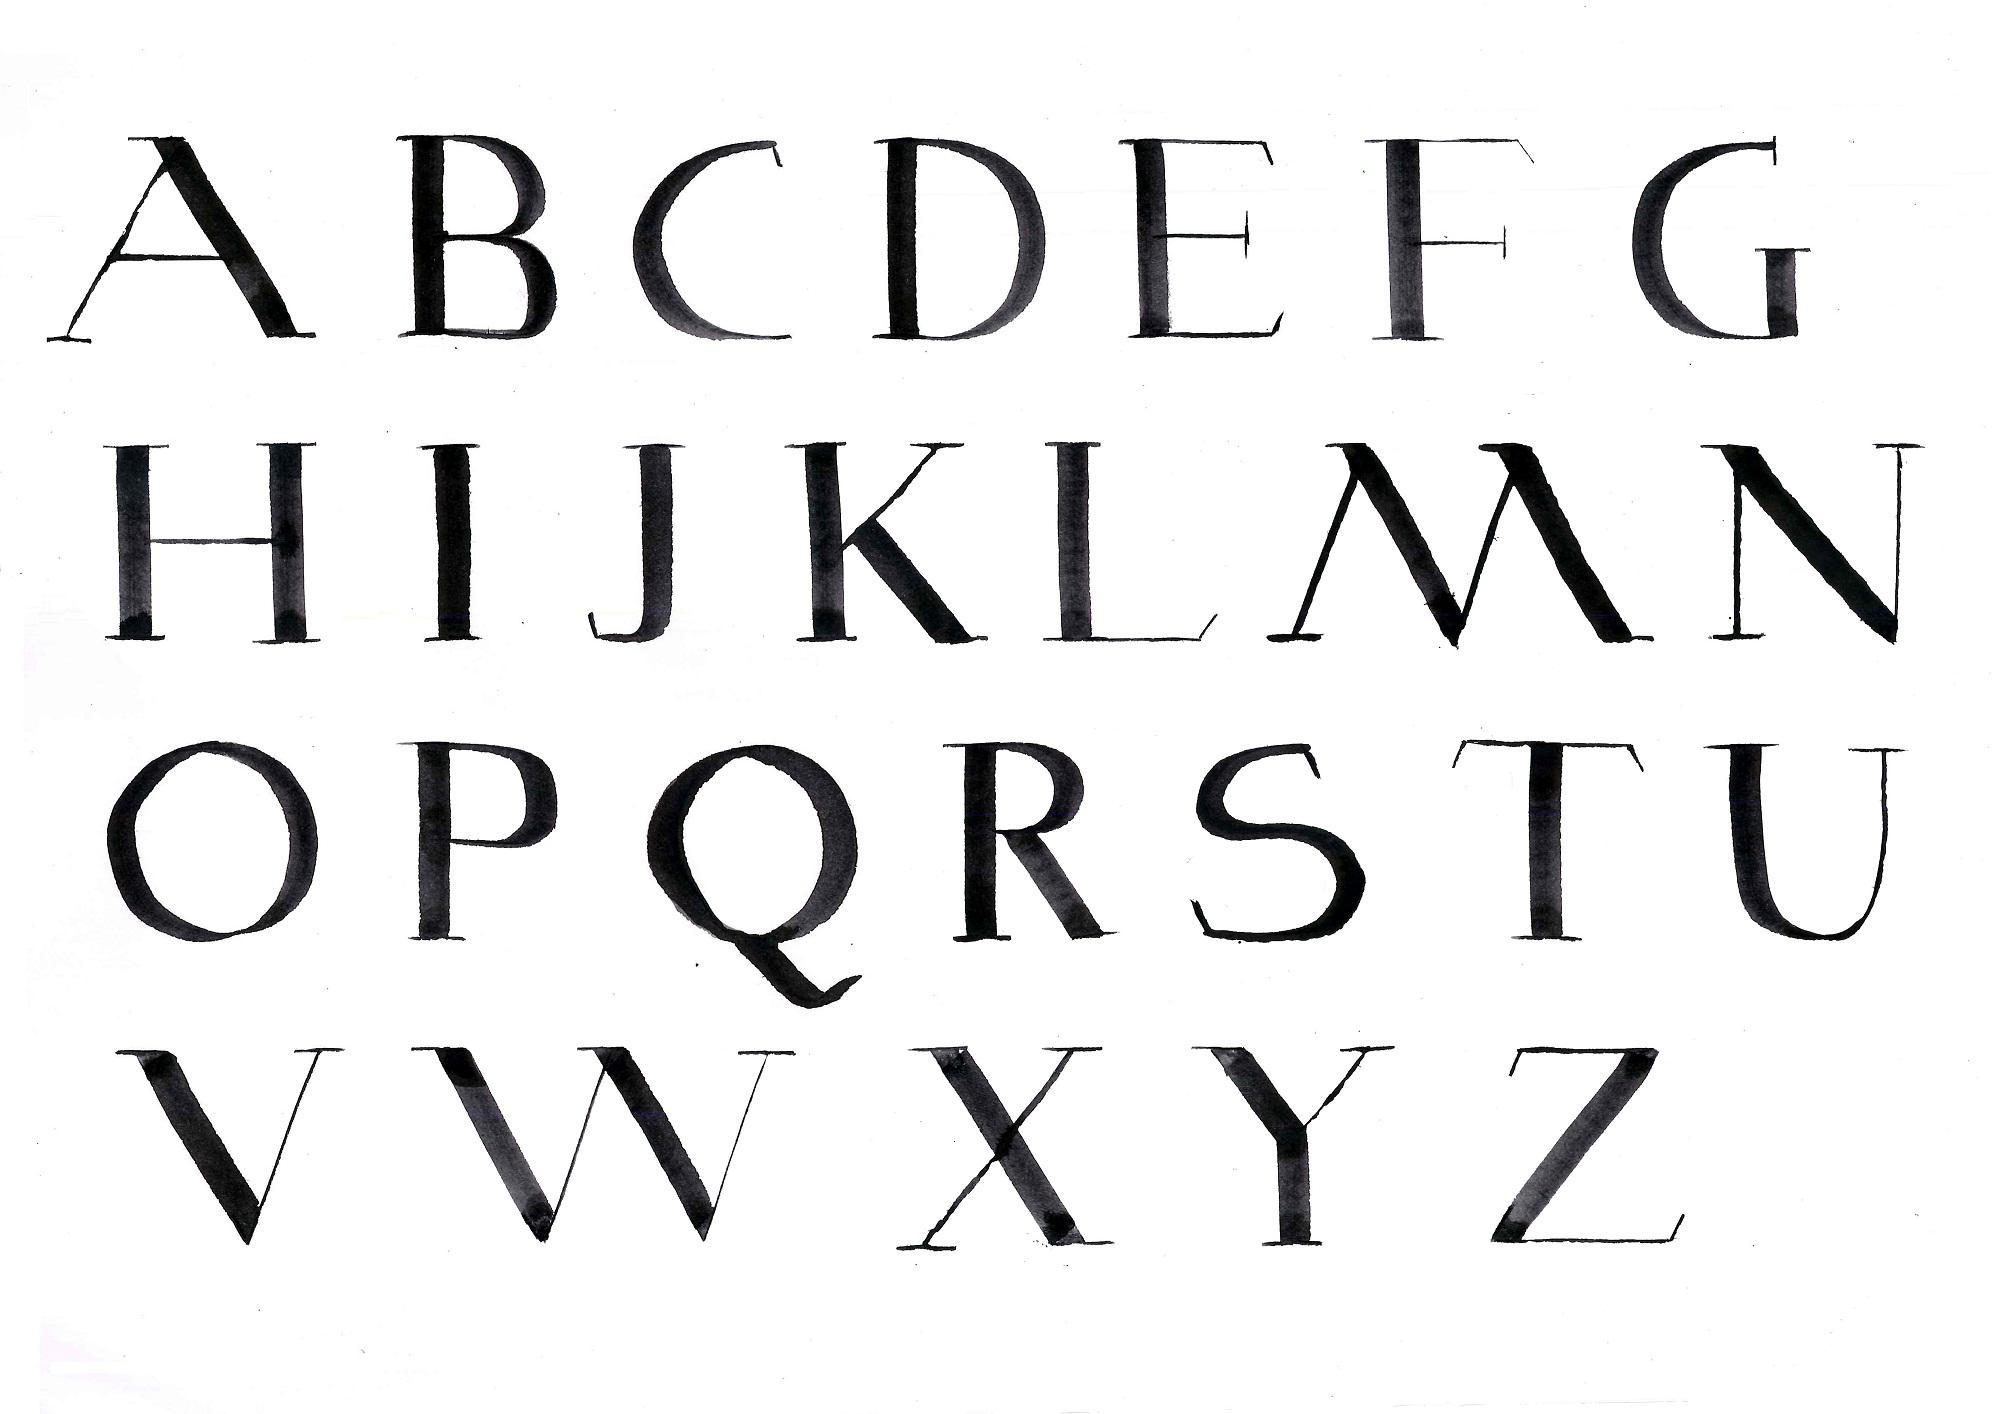 capital alphabet letters for kids